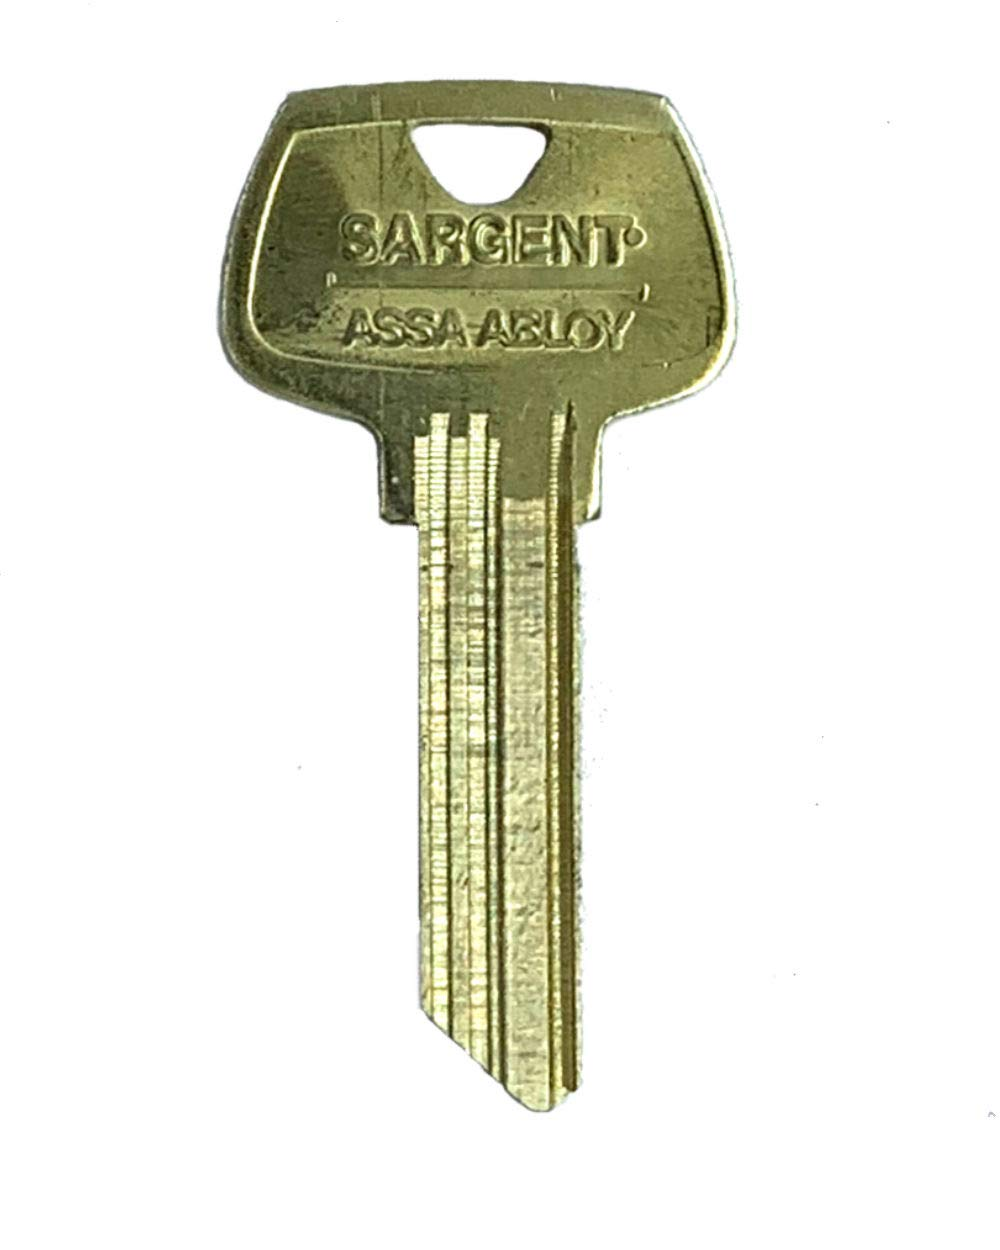 Sargent 6 Pin Key Blank 6275 HF Keyway, Pkg of 10, Factory Original